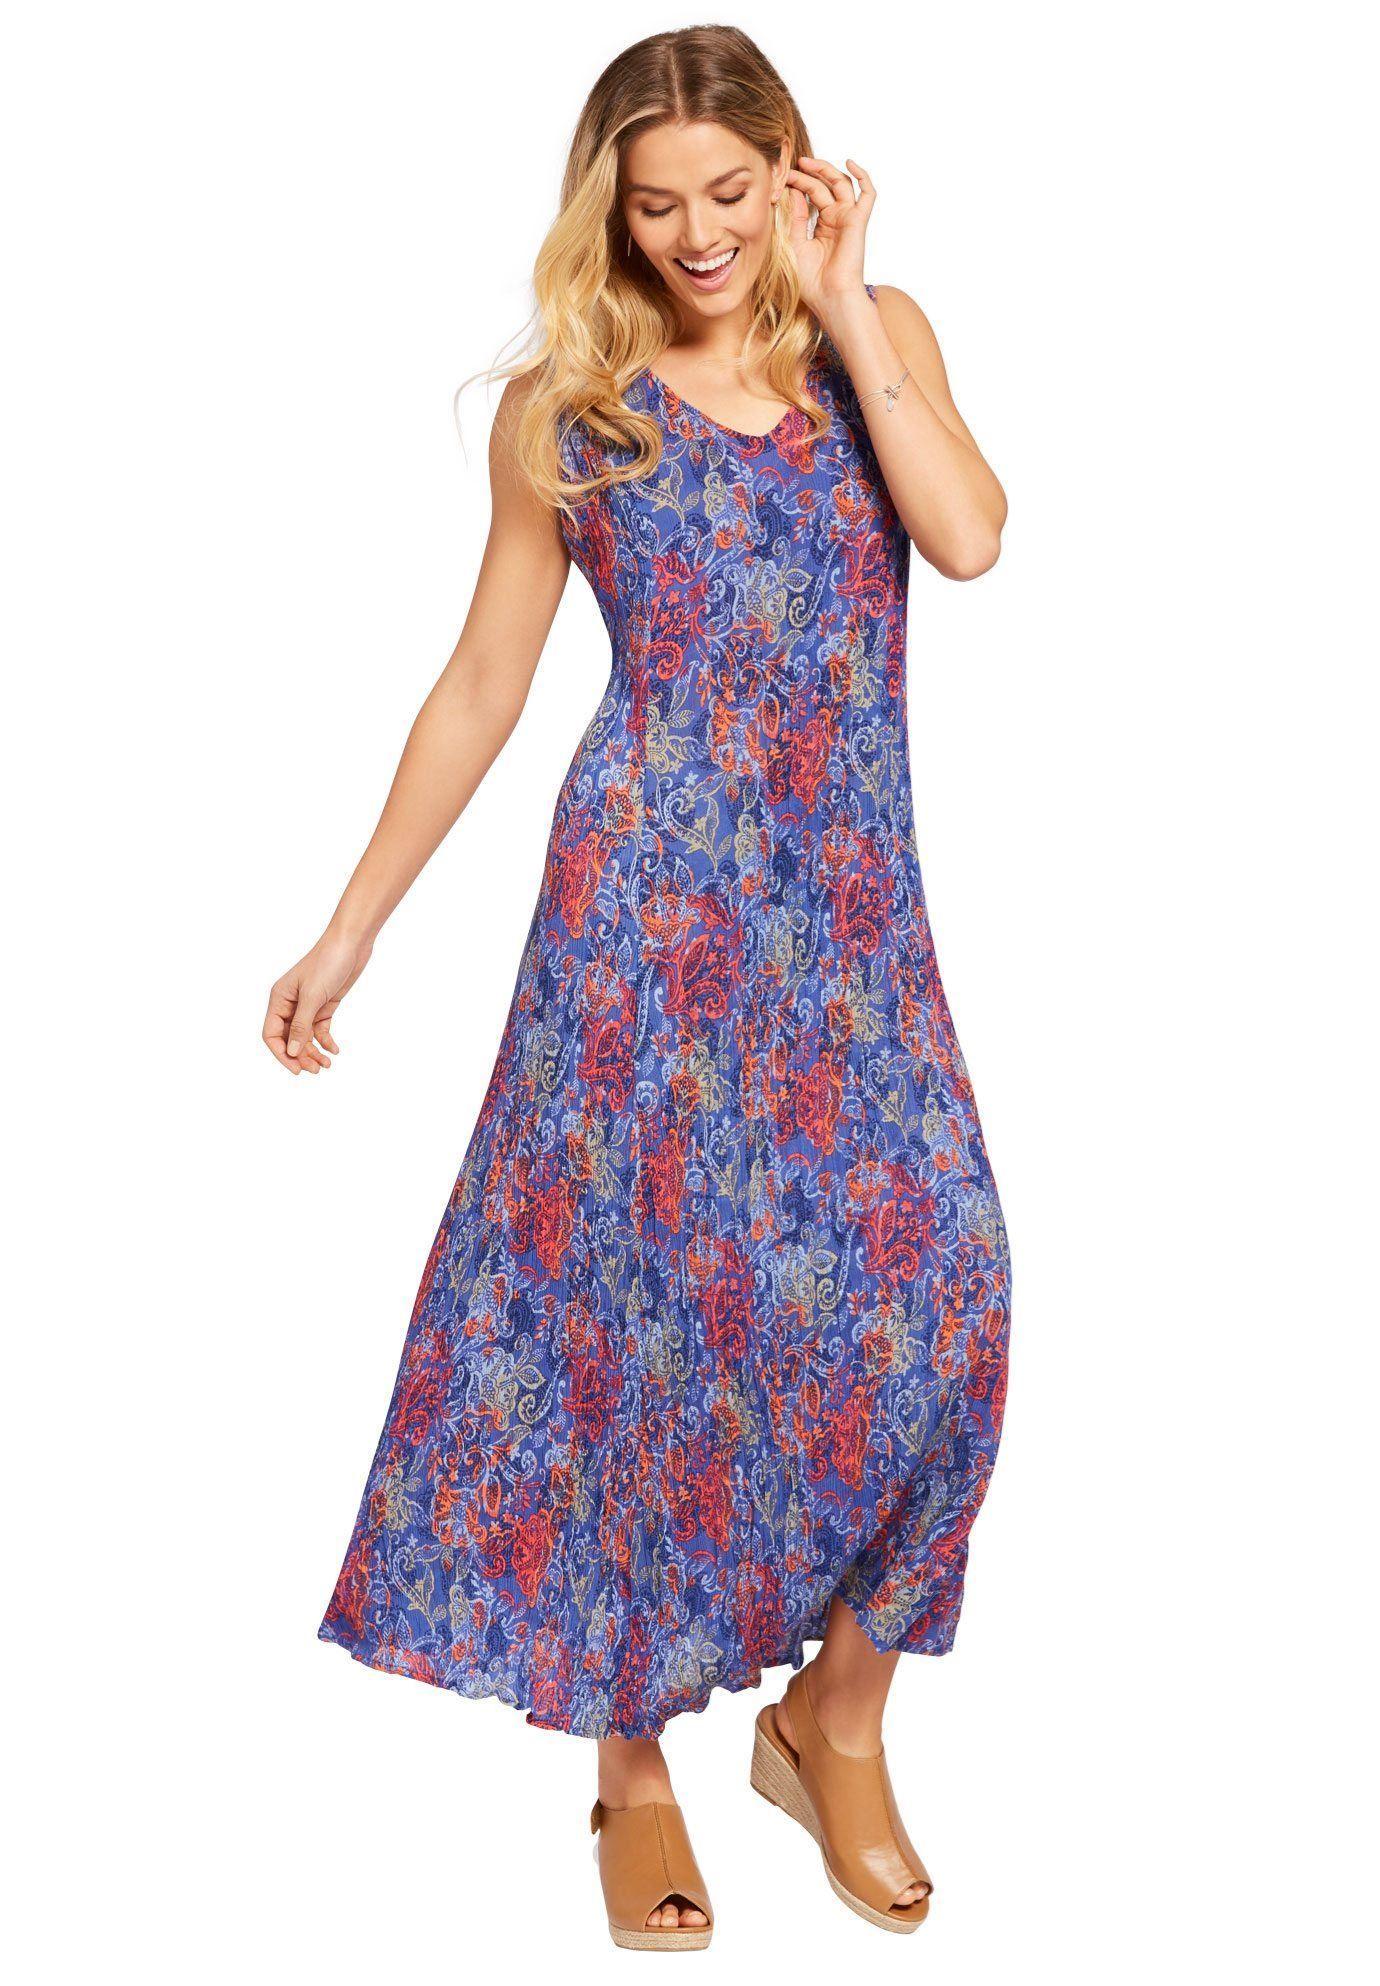 Petite Sleeveless Crinkle Dress - Women\'s Plus Size Clothing ...